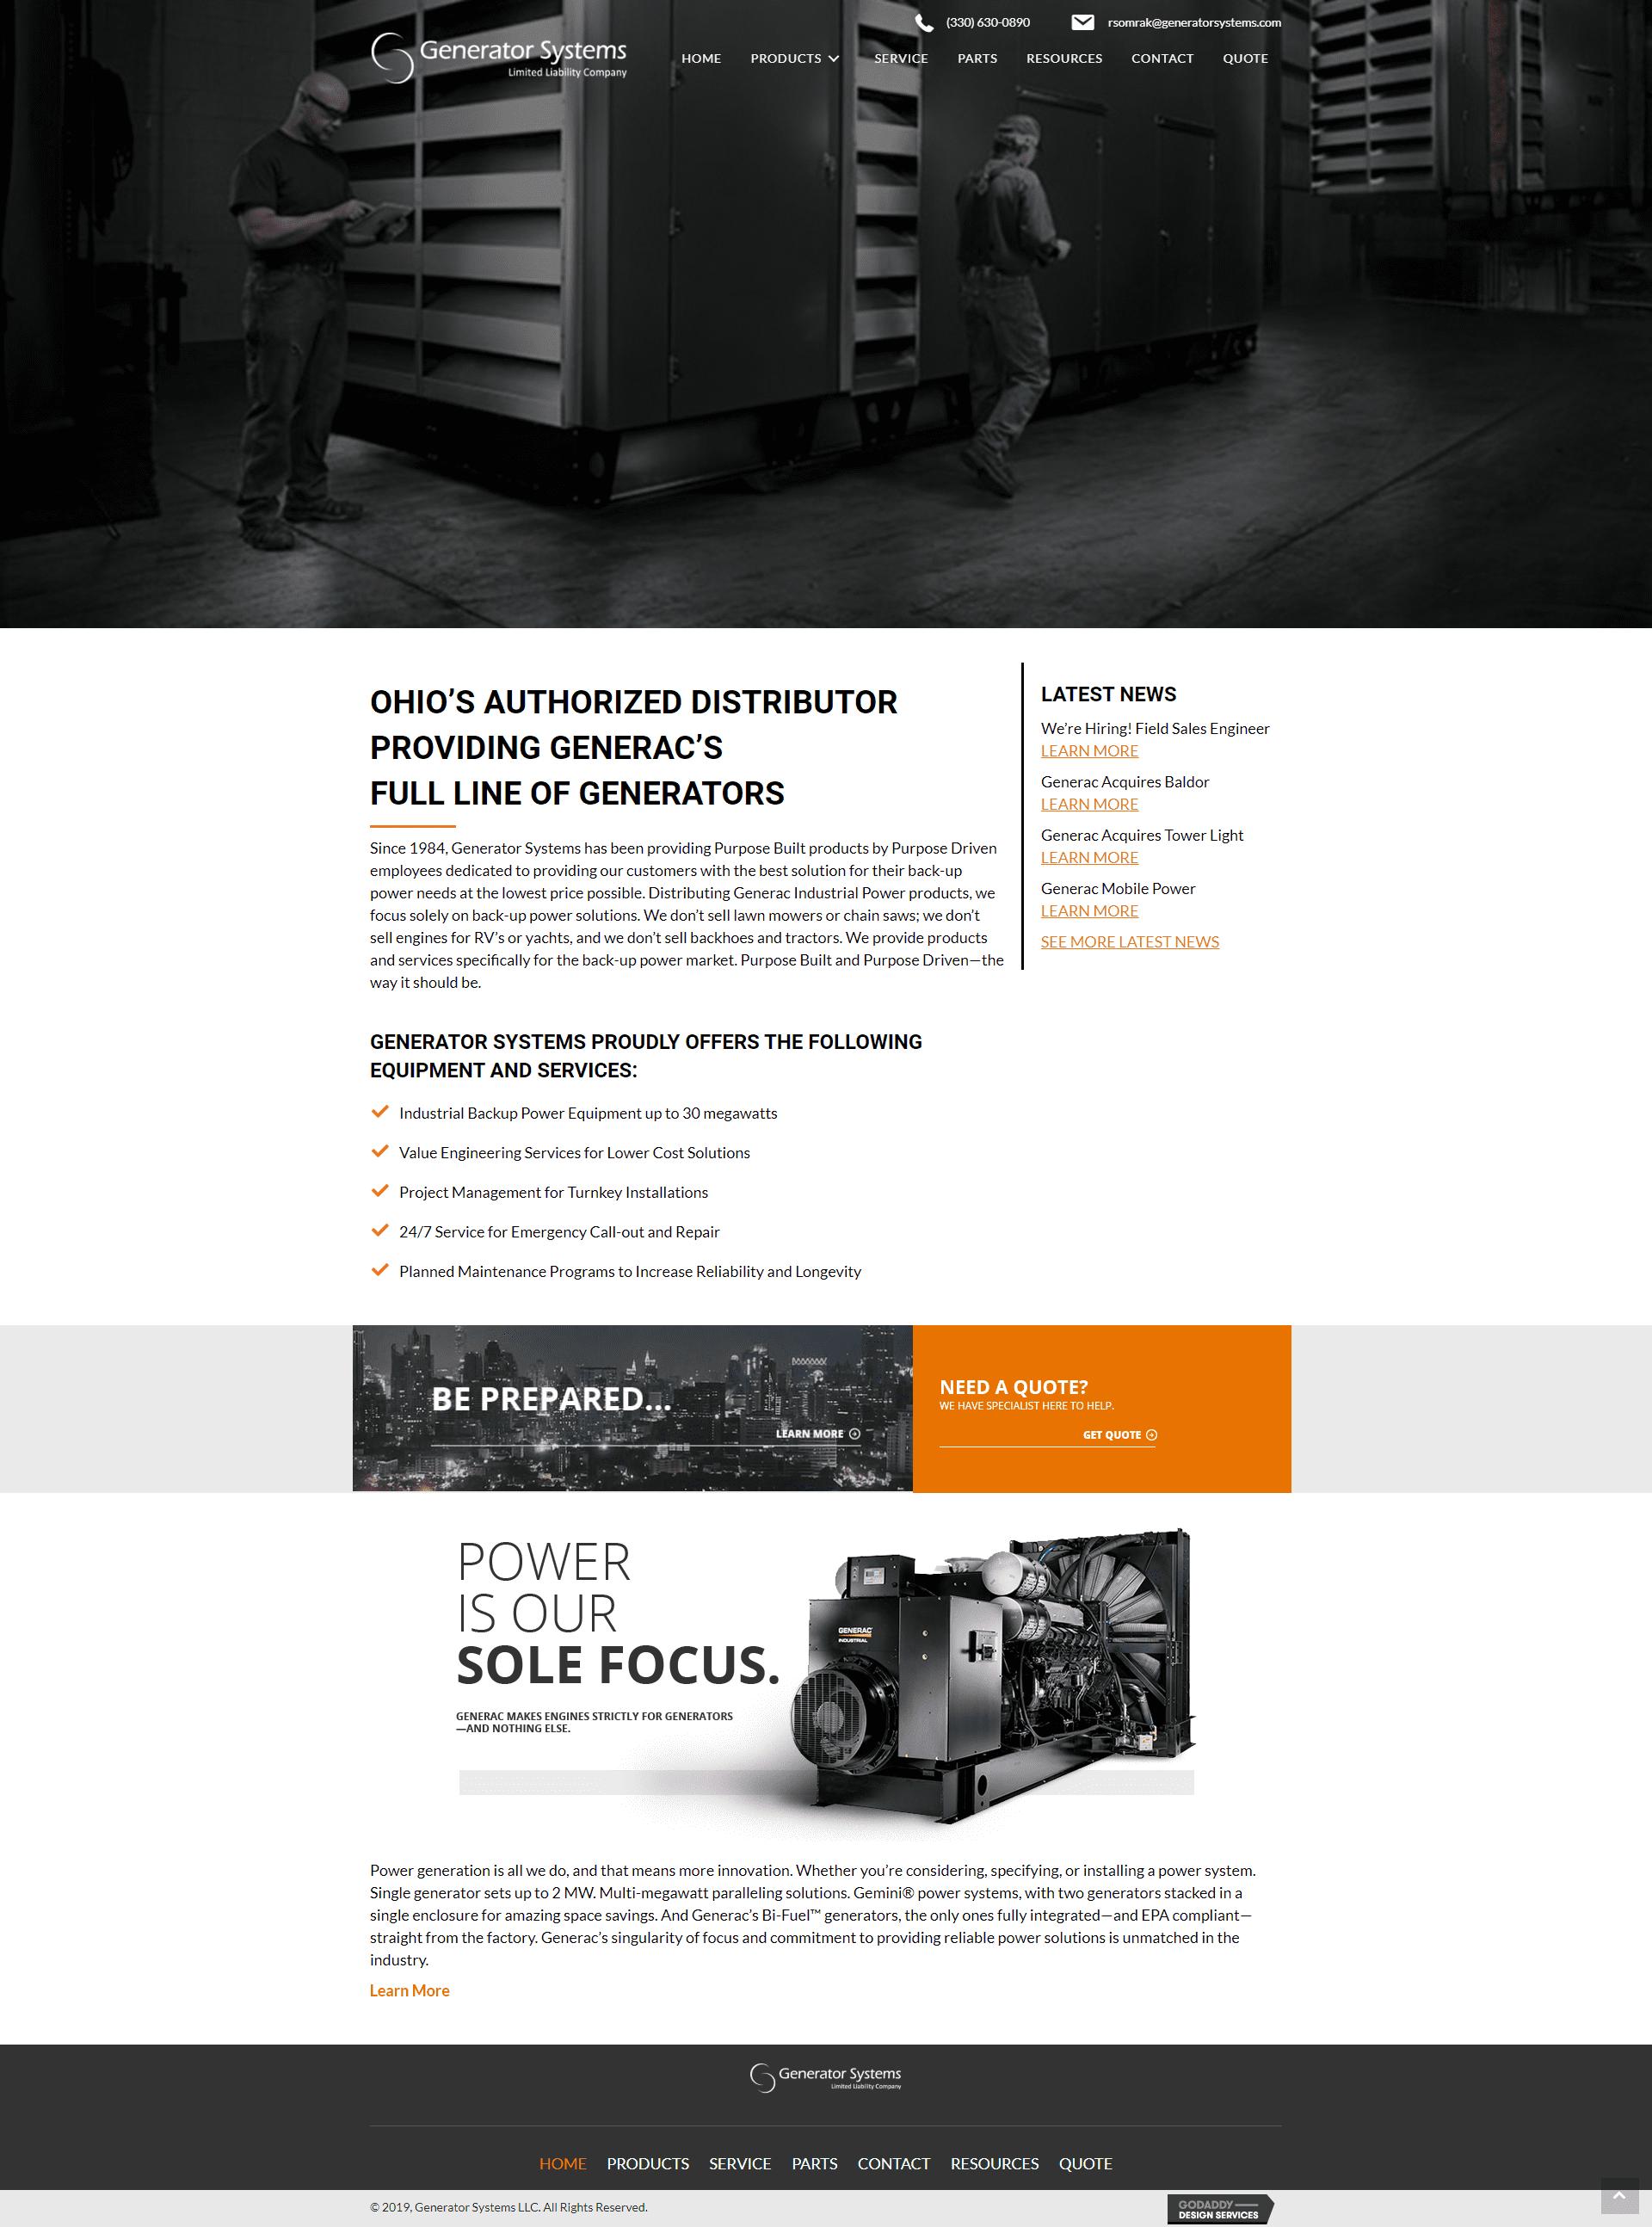 screencapture-Generator Systems-desktop